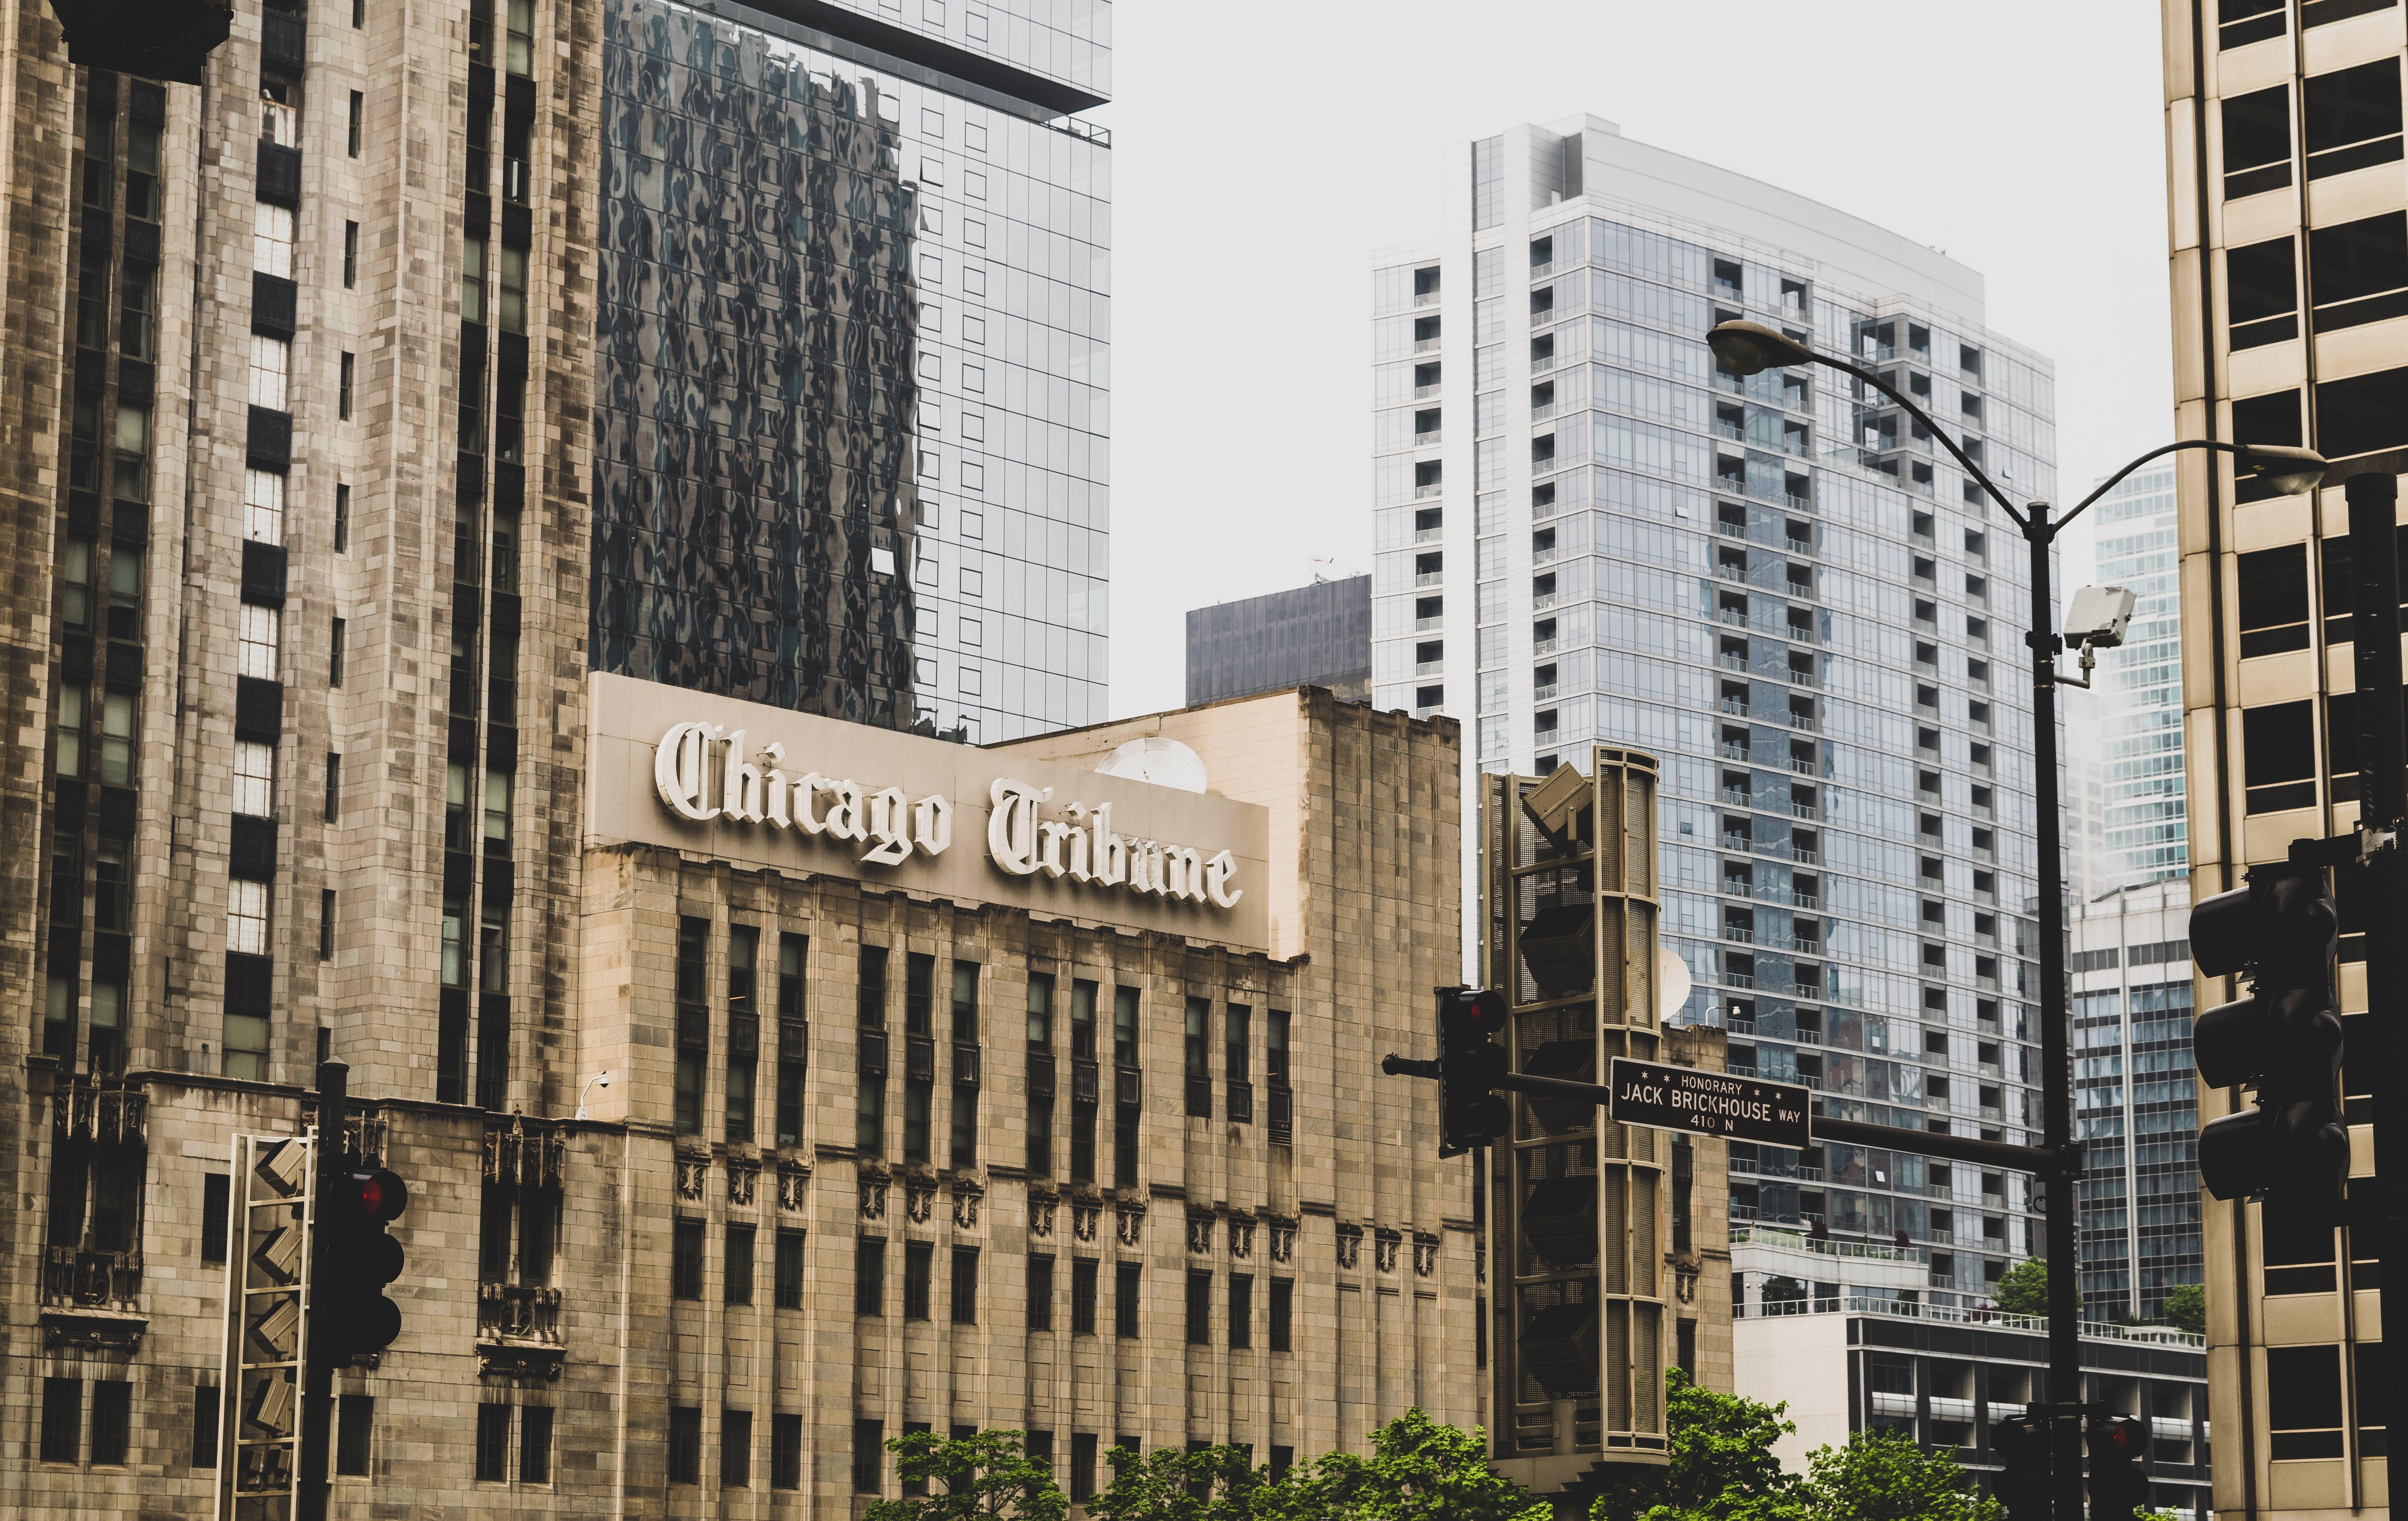 Chicago Tribune Building Near Green Leaf Tree at Daytime